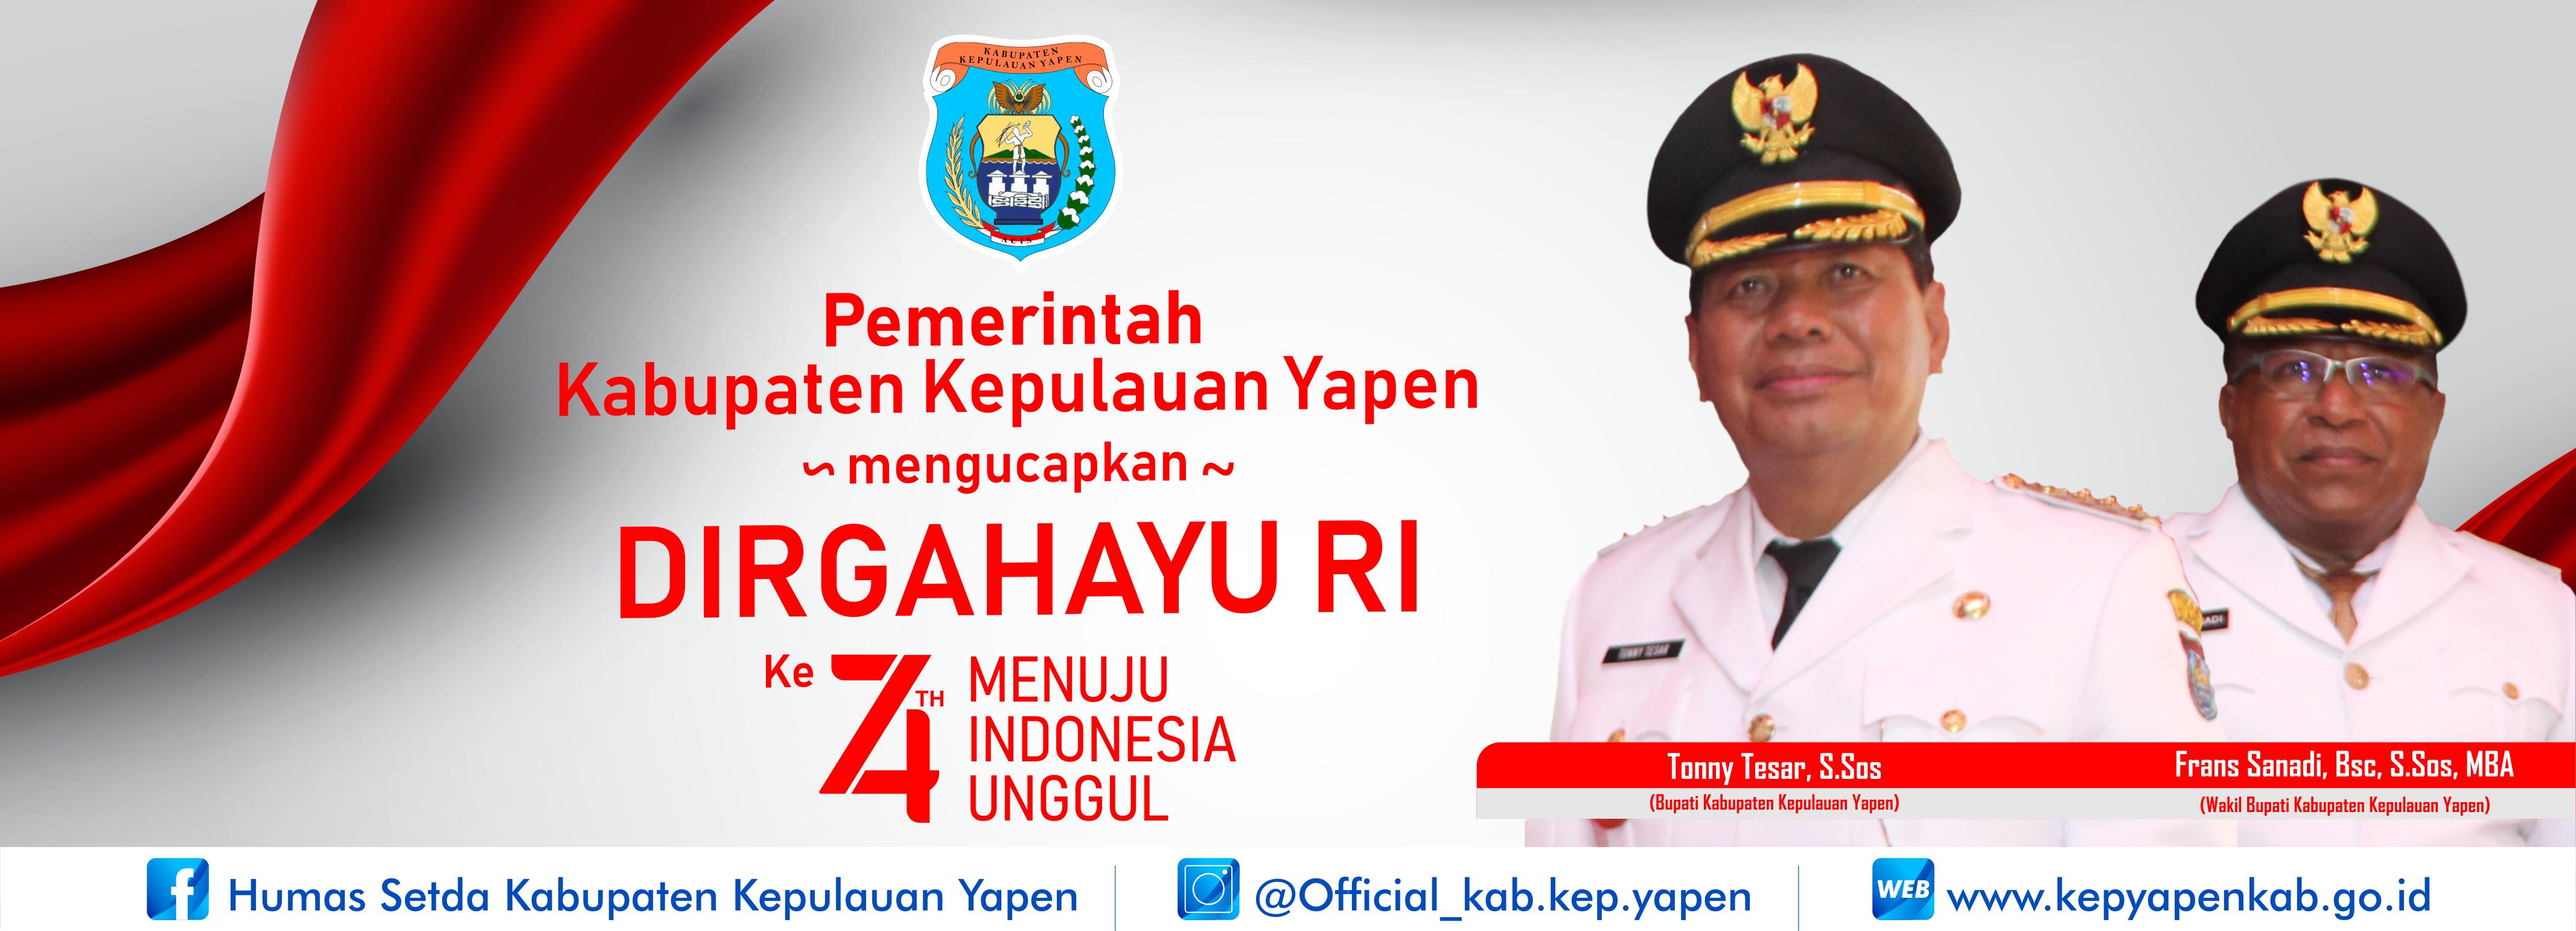 hut republik indonesia ke 74